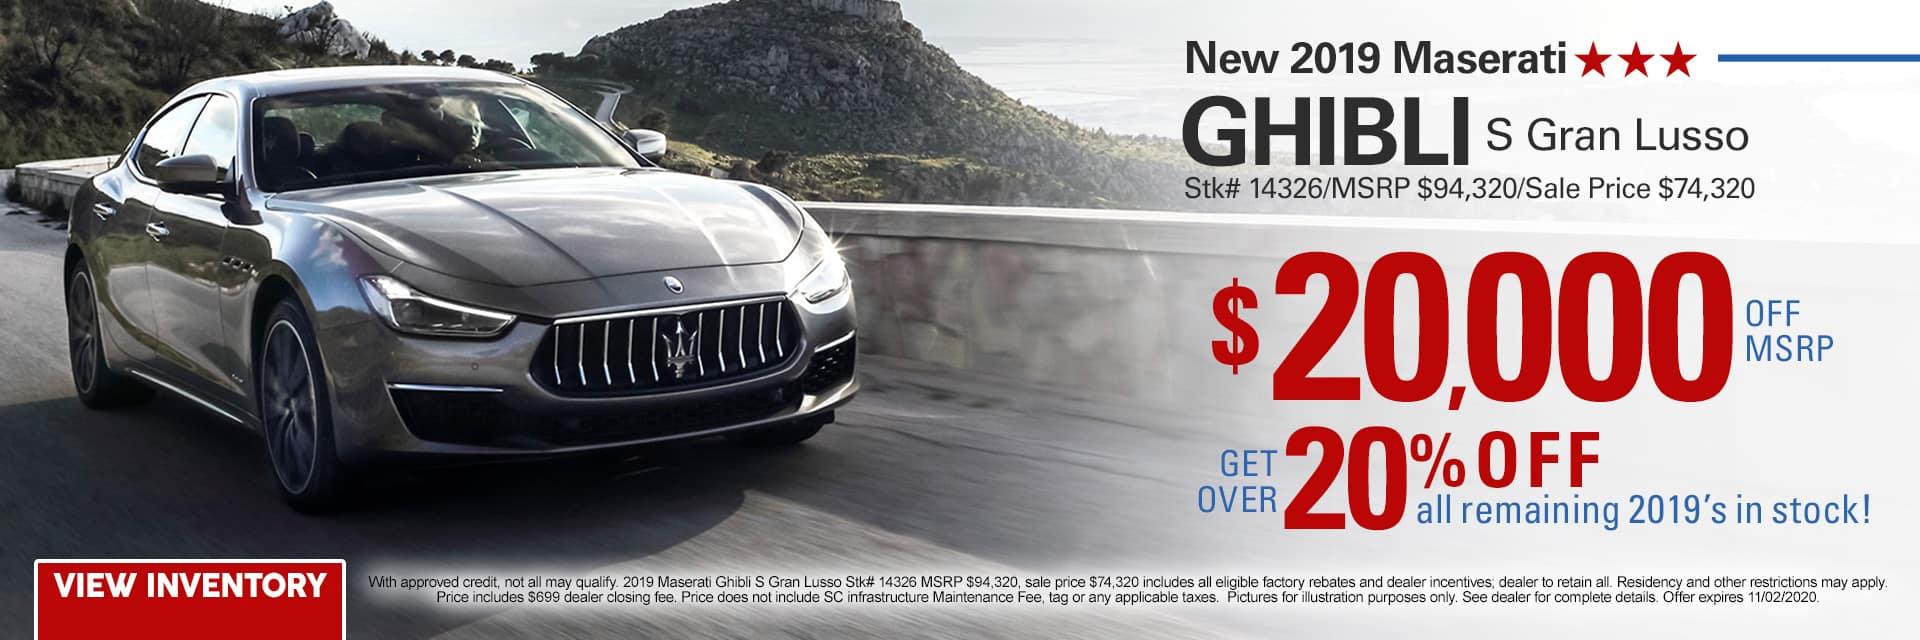 SLAM80451-02-October-2020-Web-Campaign-Maserati-slide-ghibli